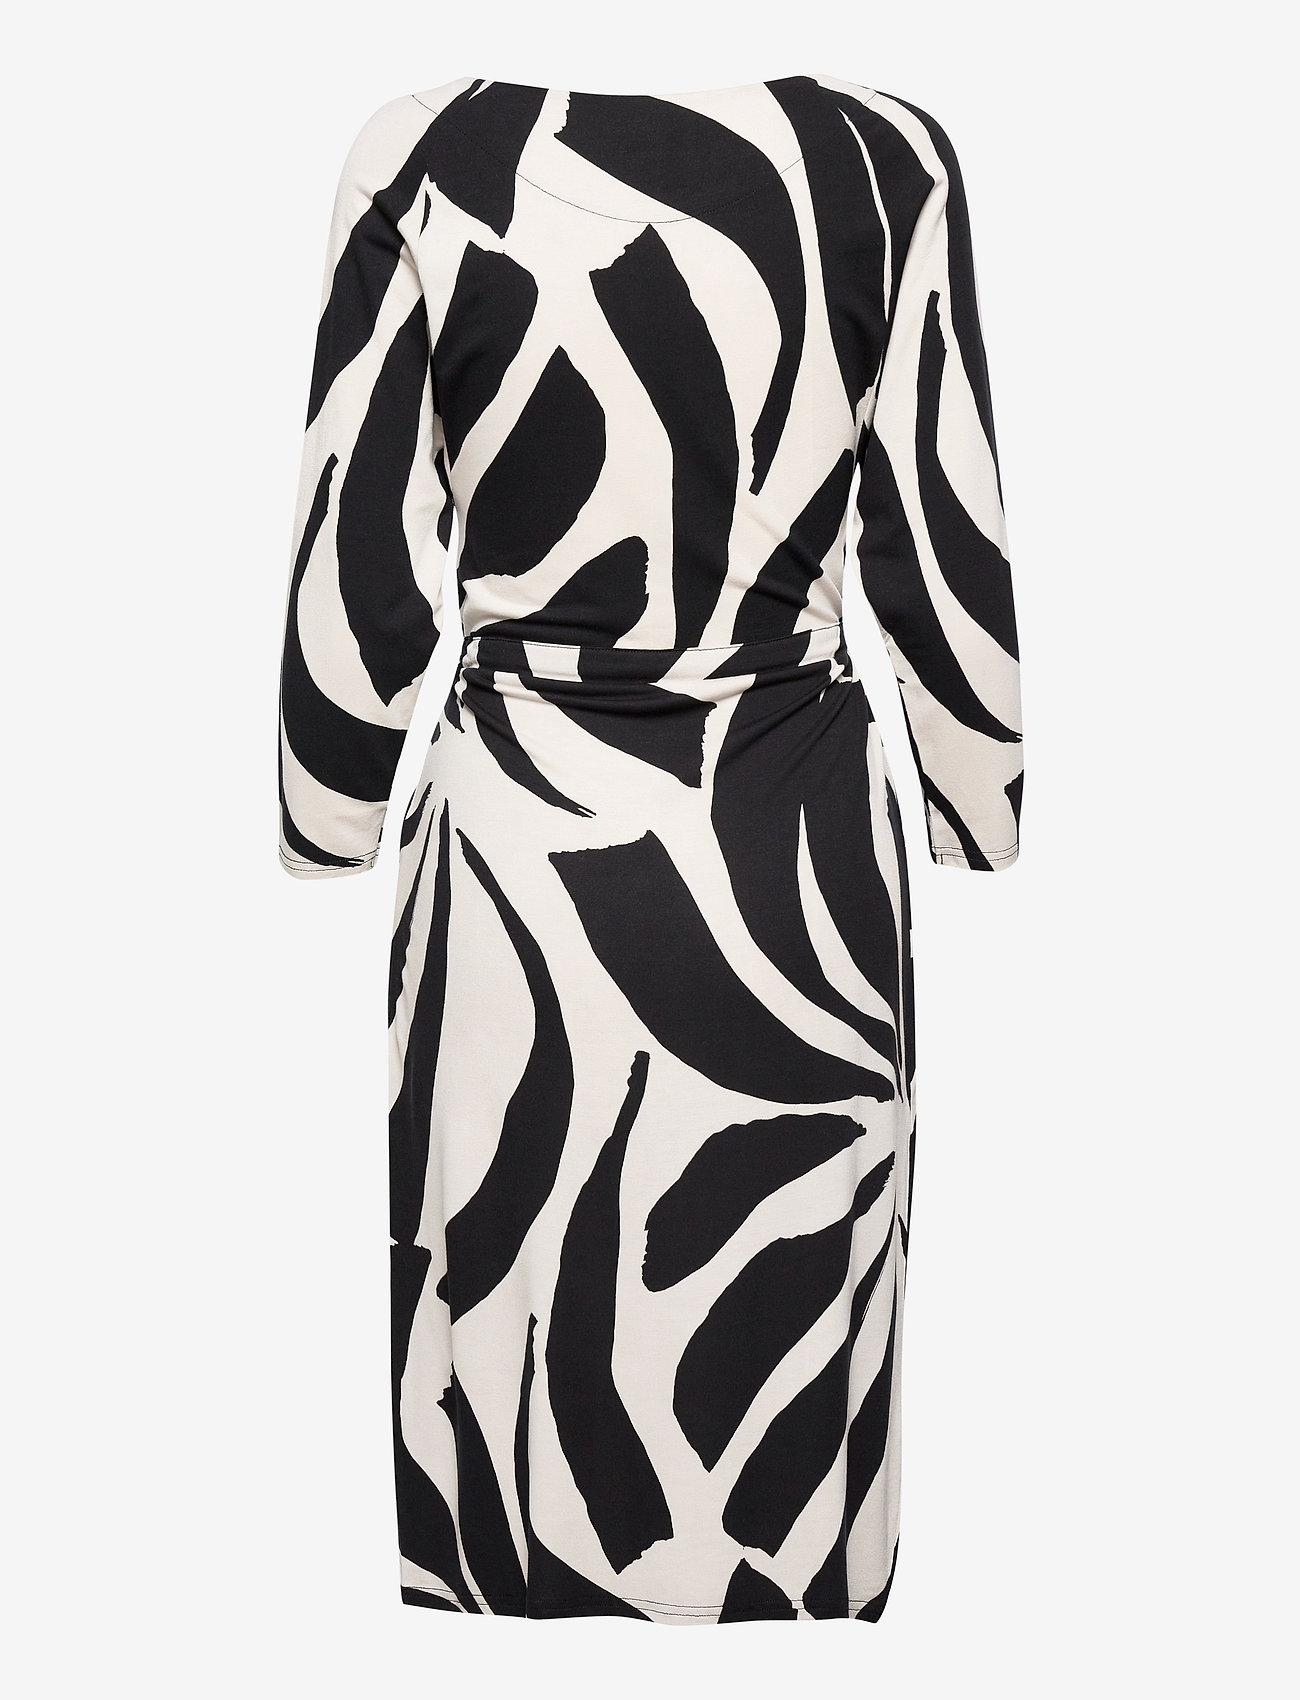 Ladies Dress, Kaisla   - Nanso -  Women's Dresses Offer